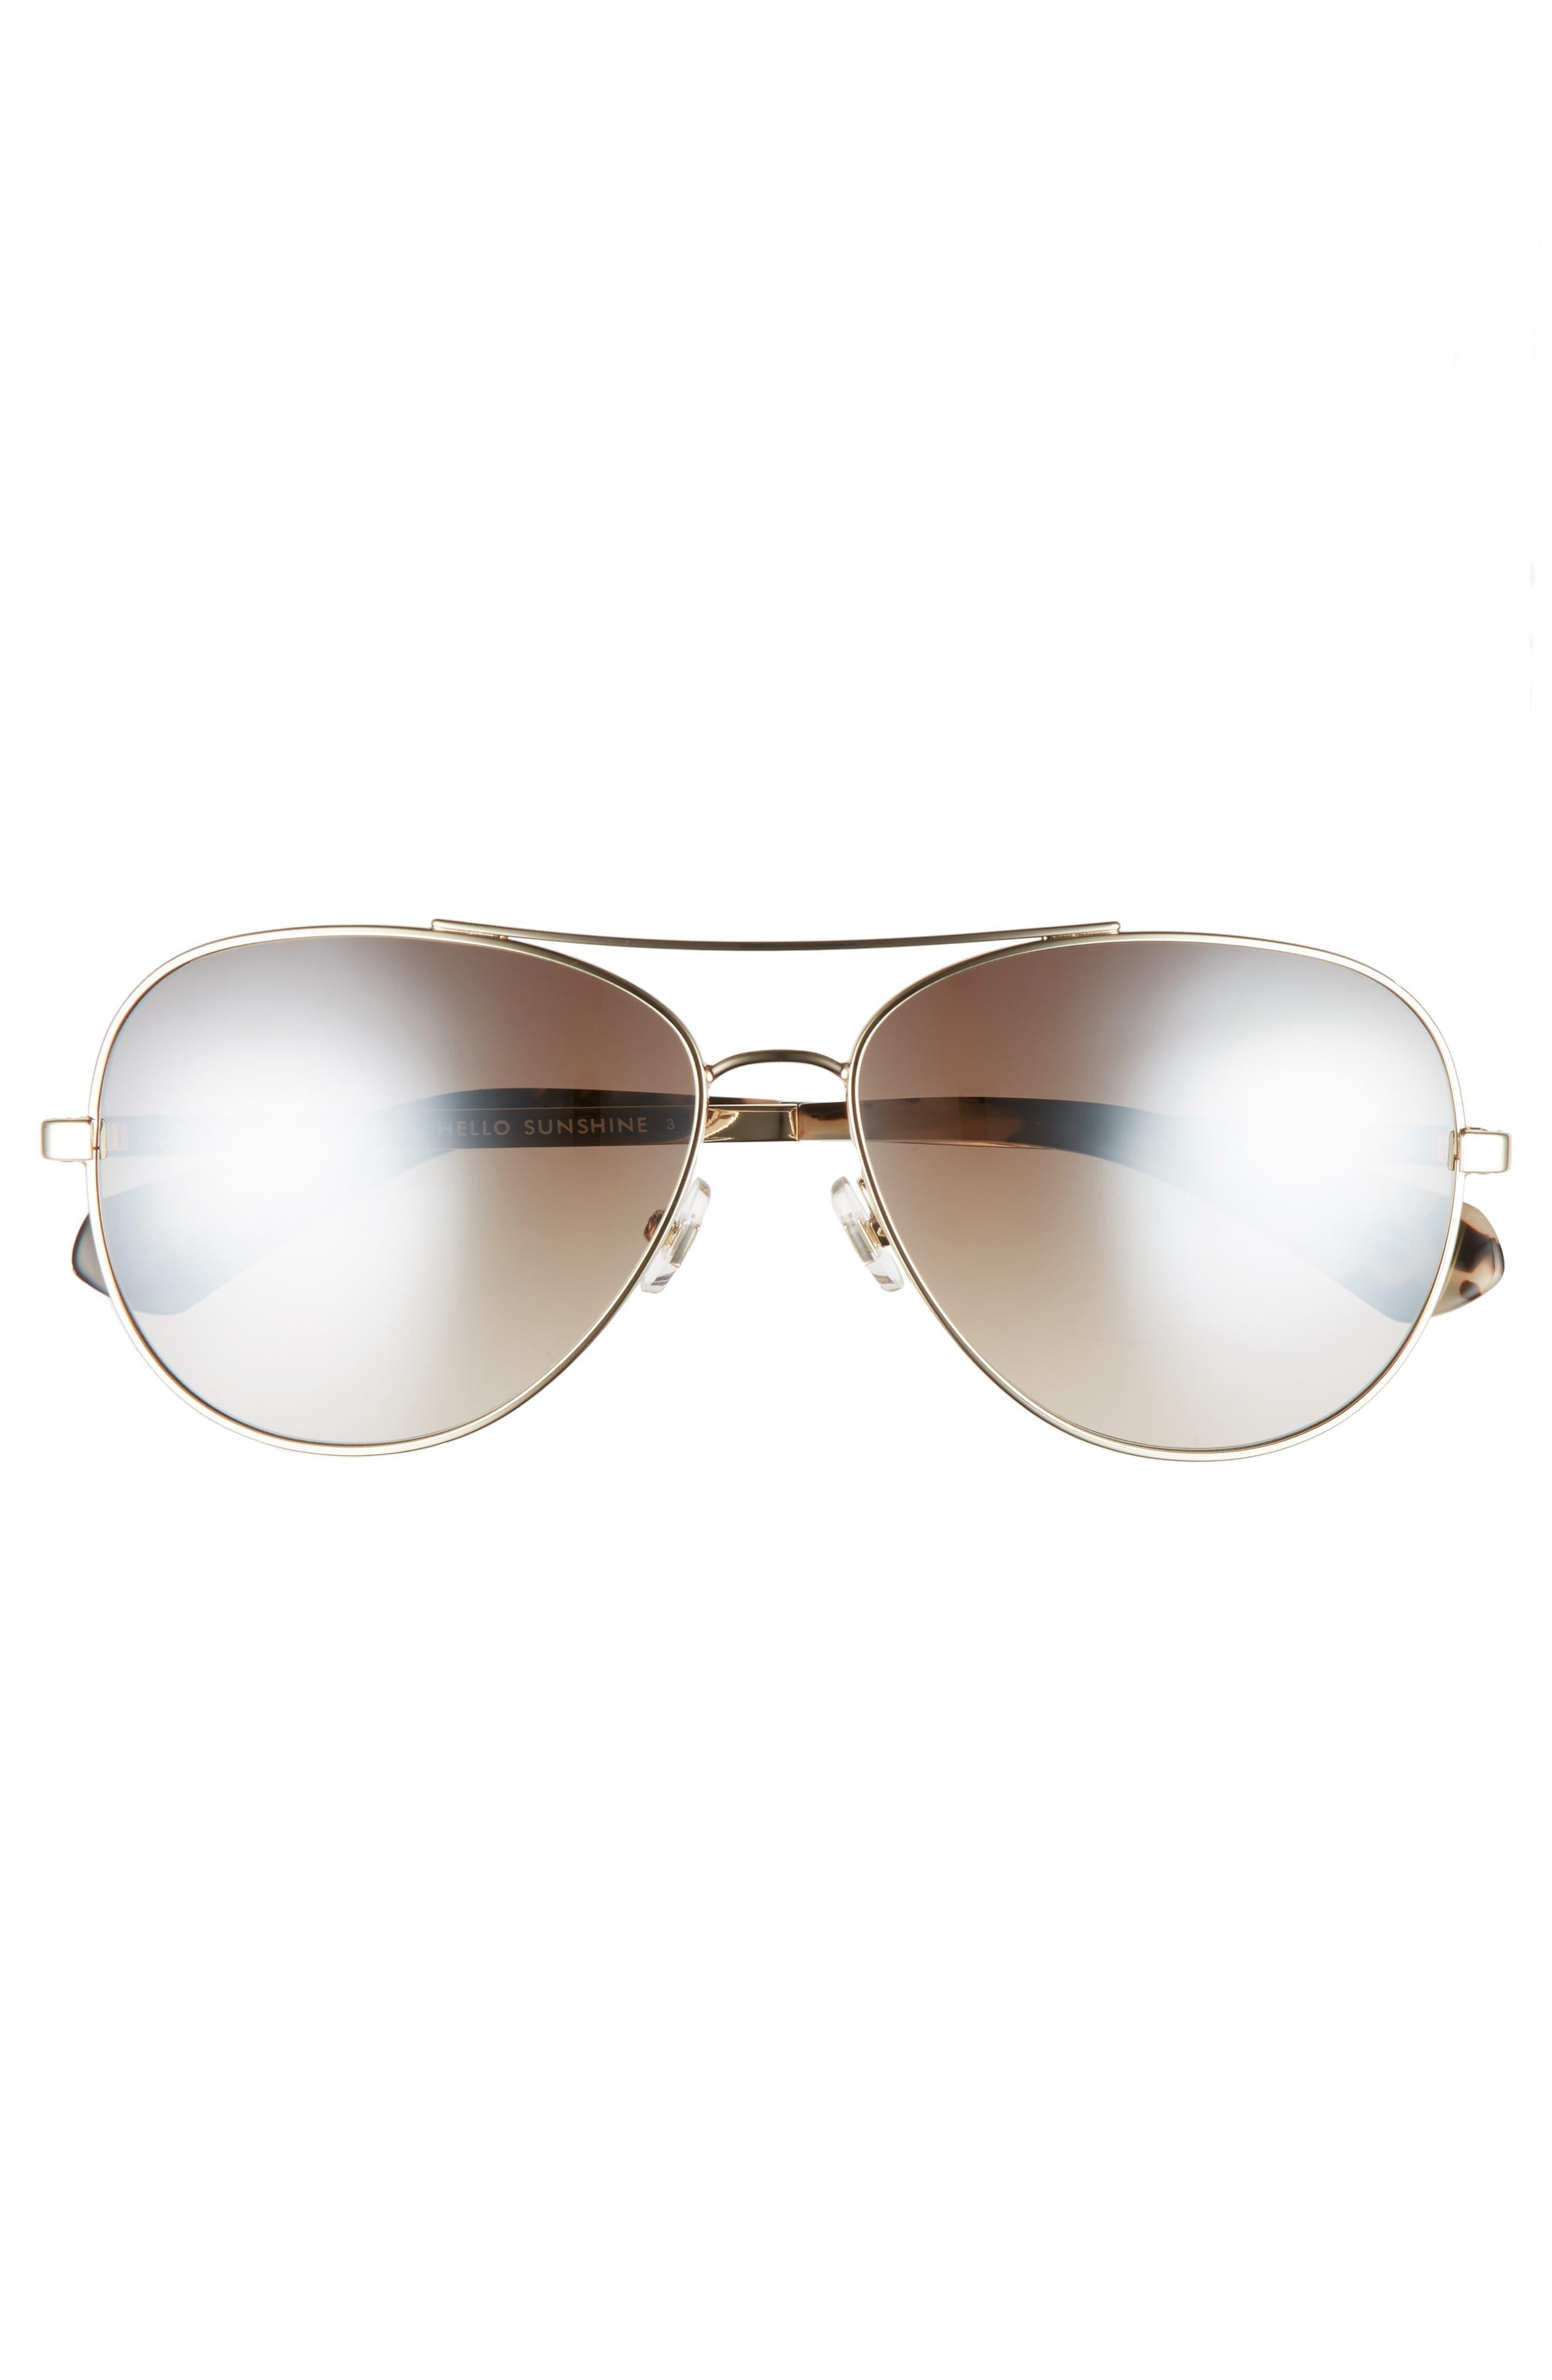 avaline 58mm aviator sunglasses,                             Alternate thumbnail 3, color,                             GOLD HAVANA